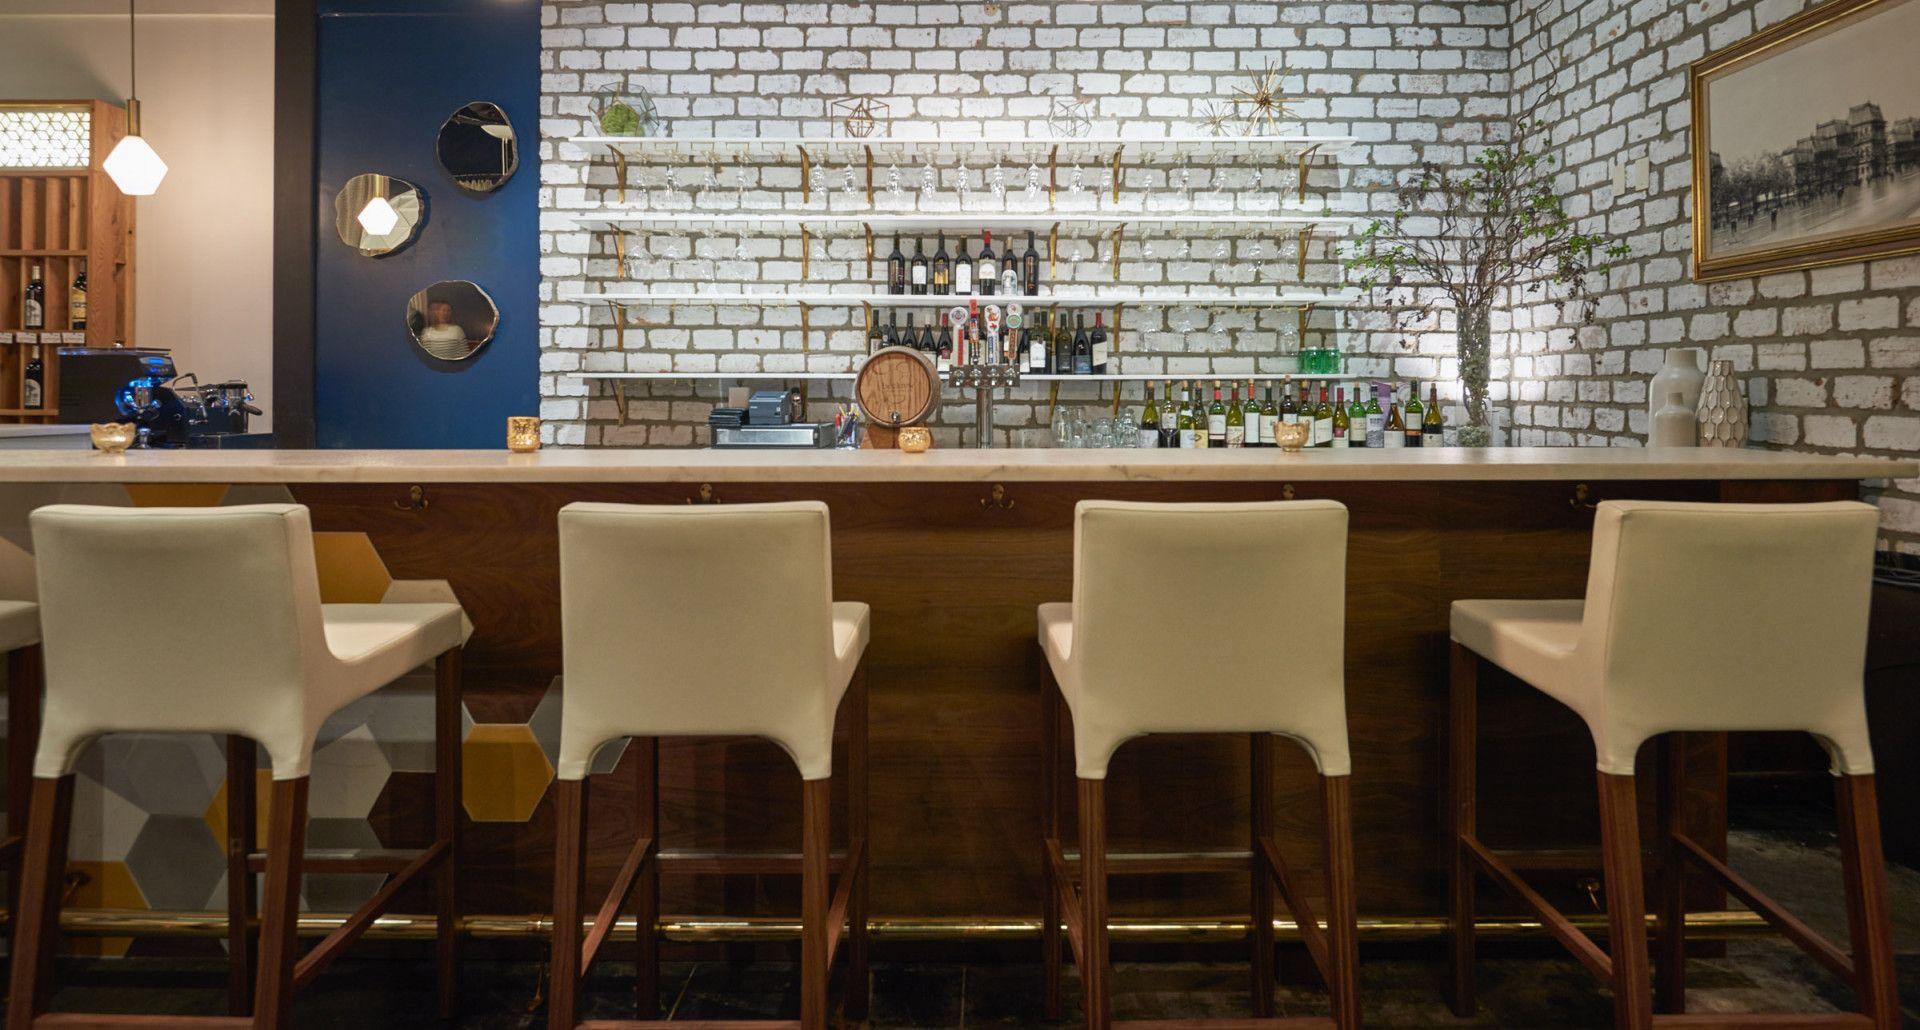 Kitchen Designers Houston Awesome Restaurant Design Texas  Google Search  Retail Design Review